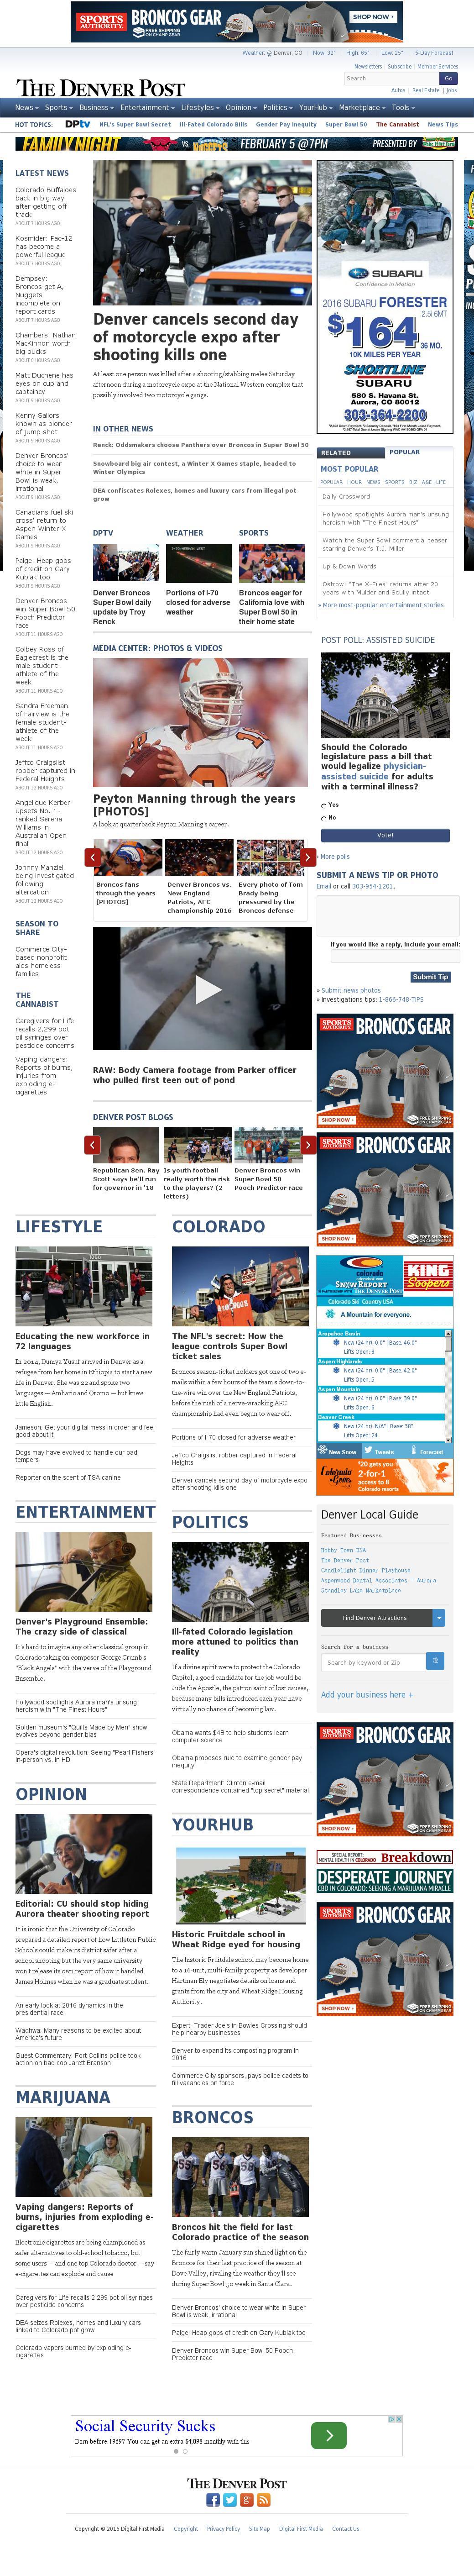 Denver Post at Sunday Jan. 31, 2016, 3:04 a.m. UTC